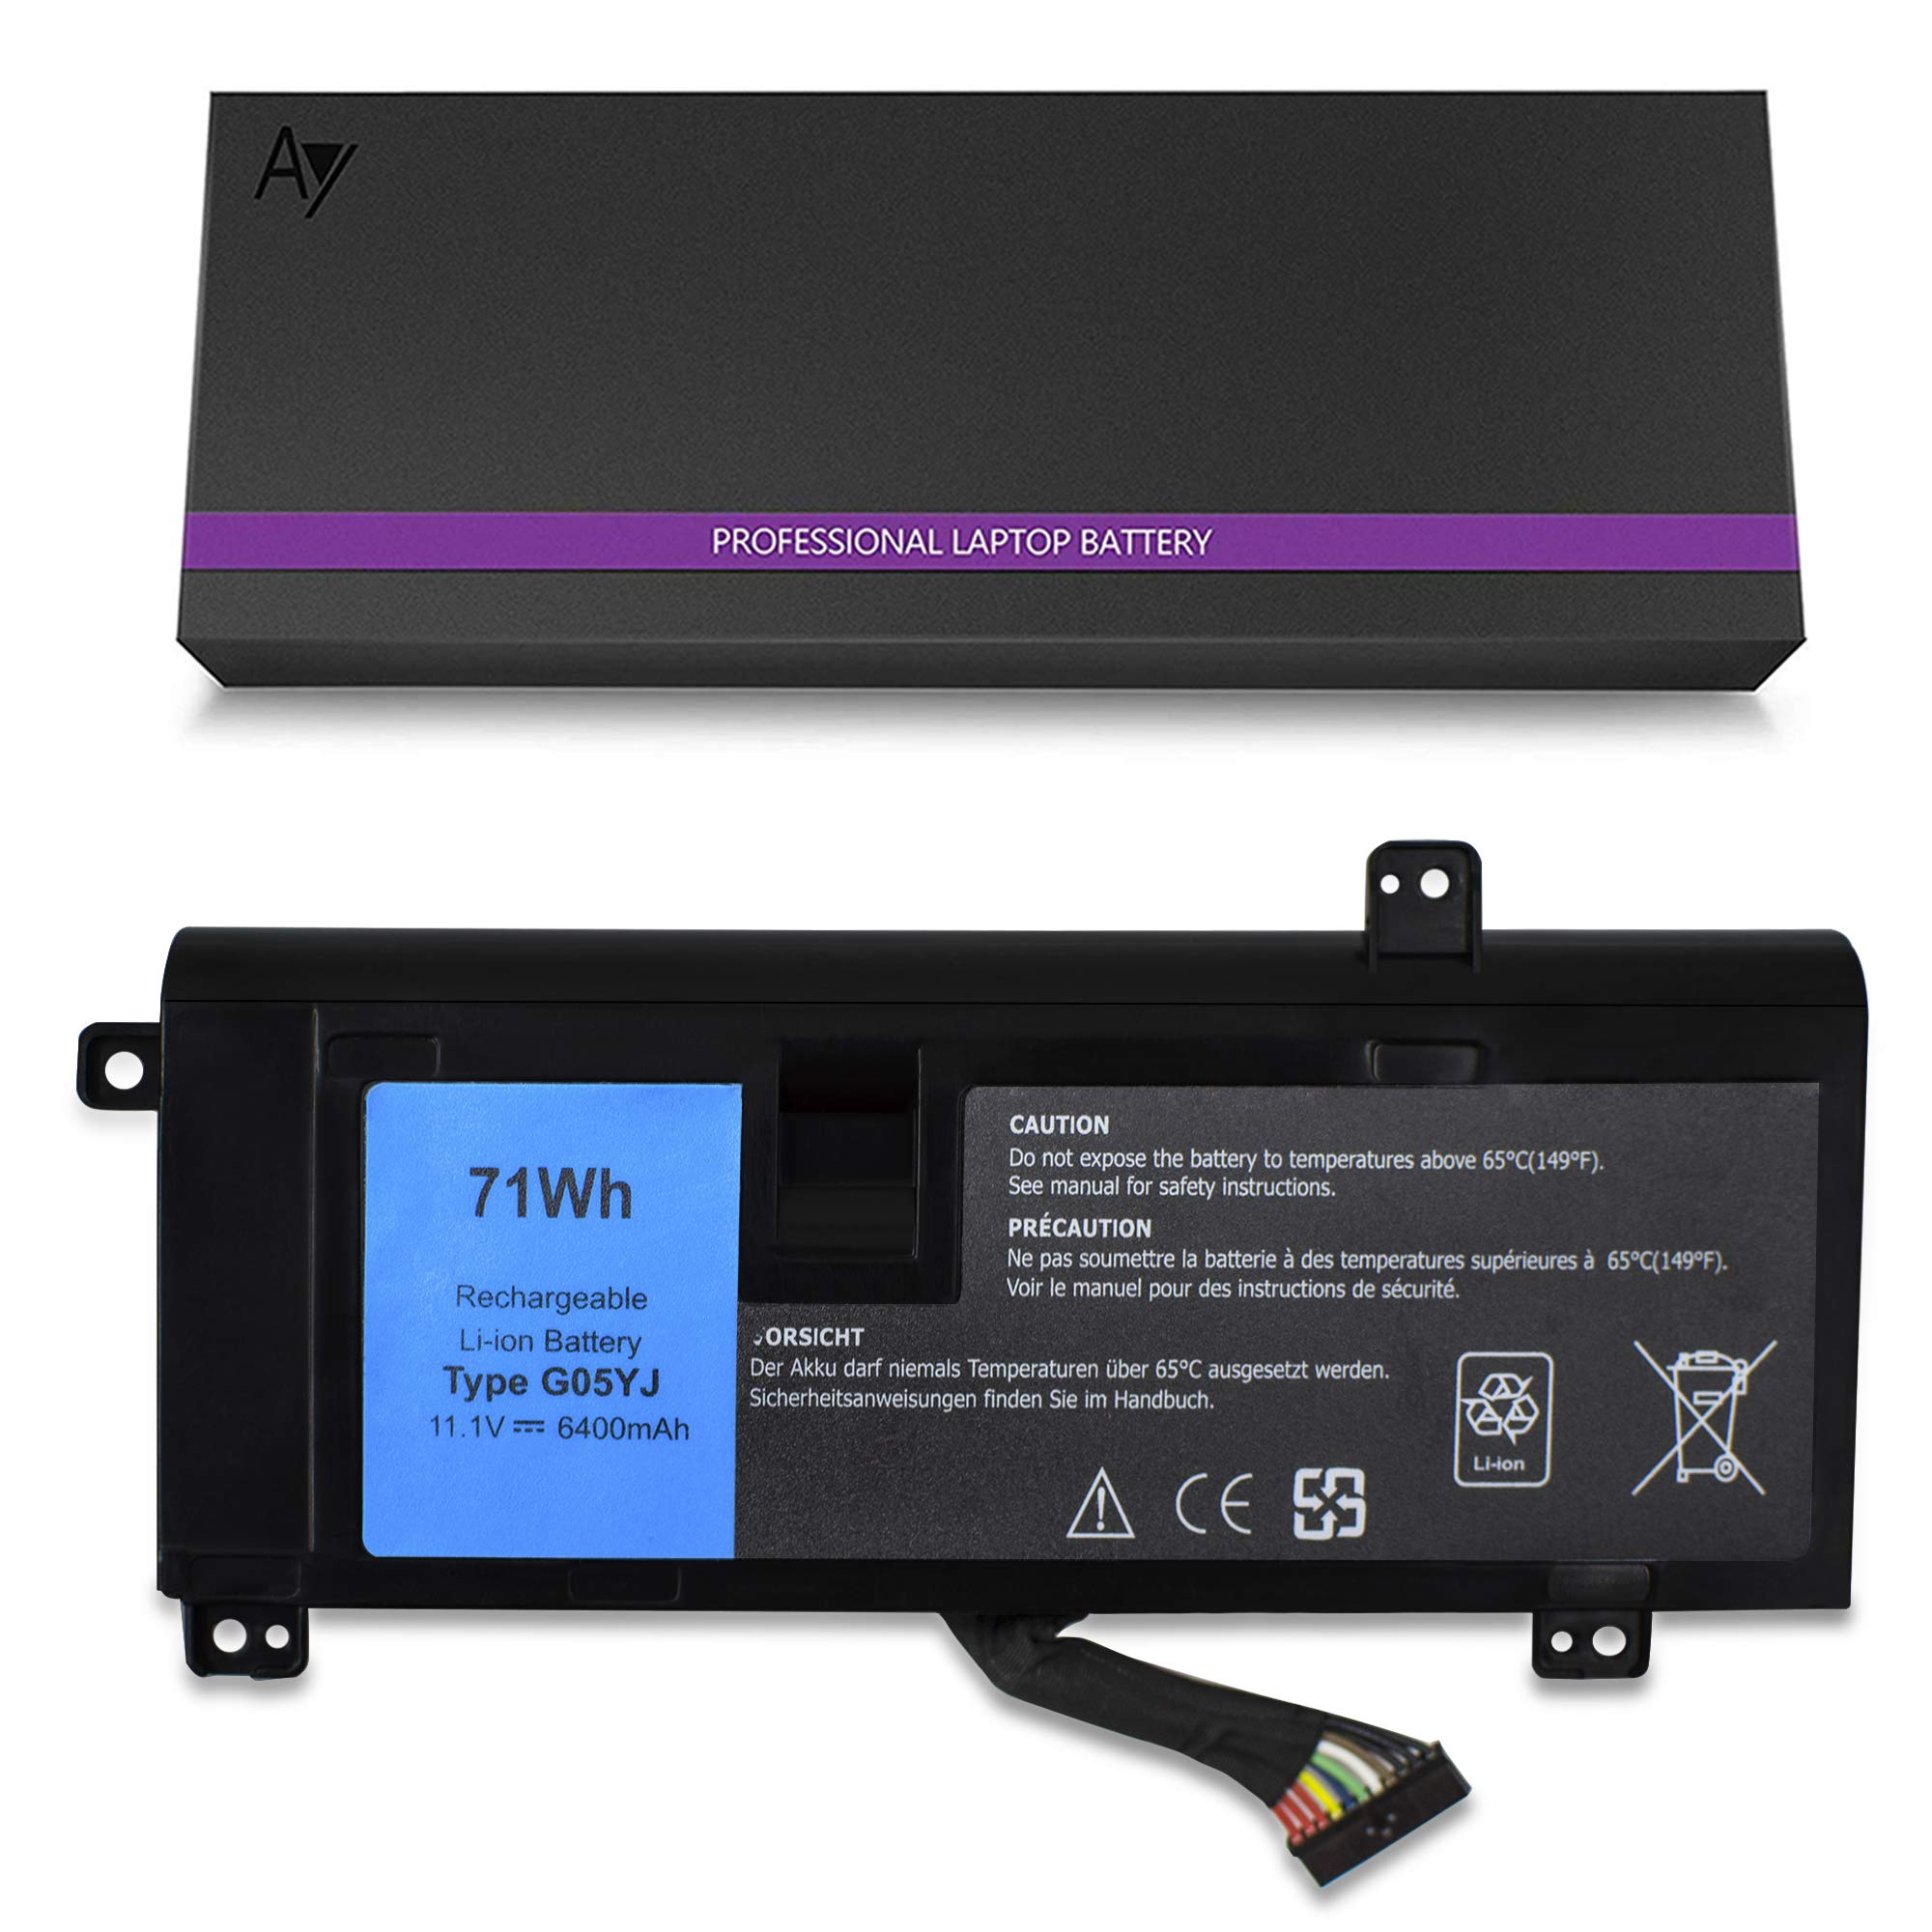 Bateria G05yj 11.1v / 71wh Compatible 14 A14 M14x R3 R4 Series 14d-1528 G05yj 0g05yj Y3pn0 8x70t